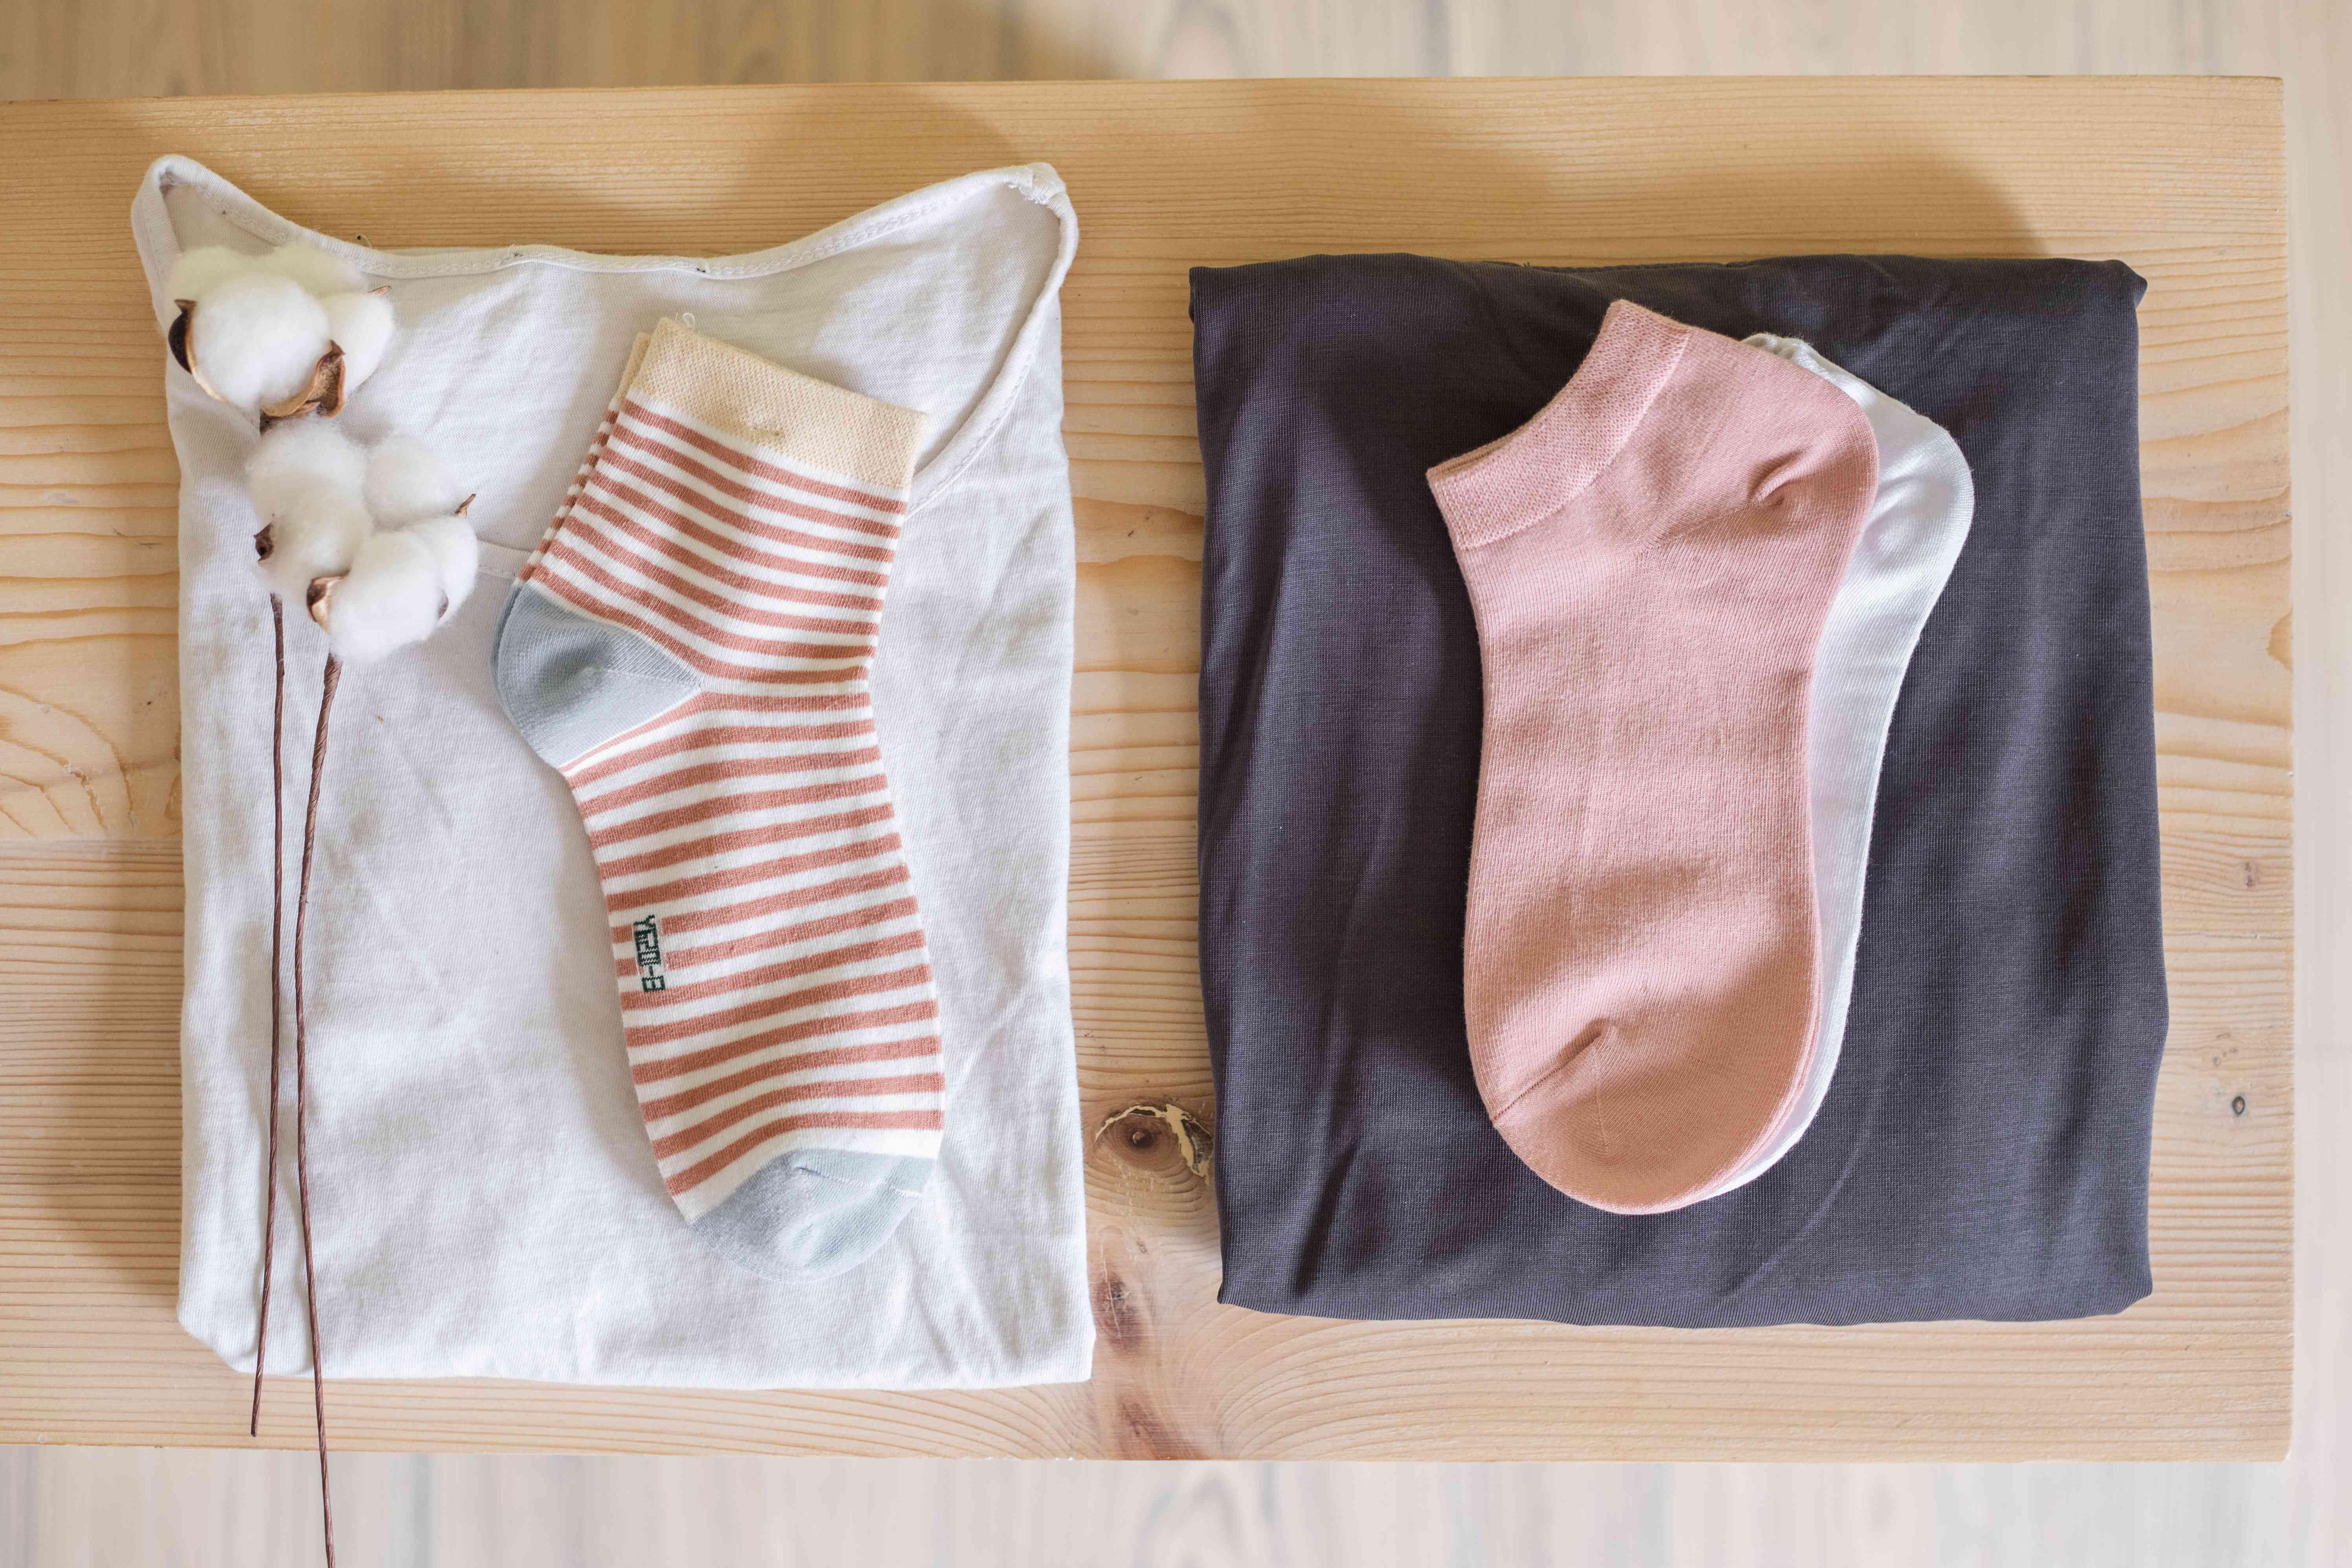 flat lay shot of cotton shirt and socks and cotton boll next to modal shirt and socks